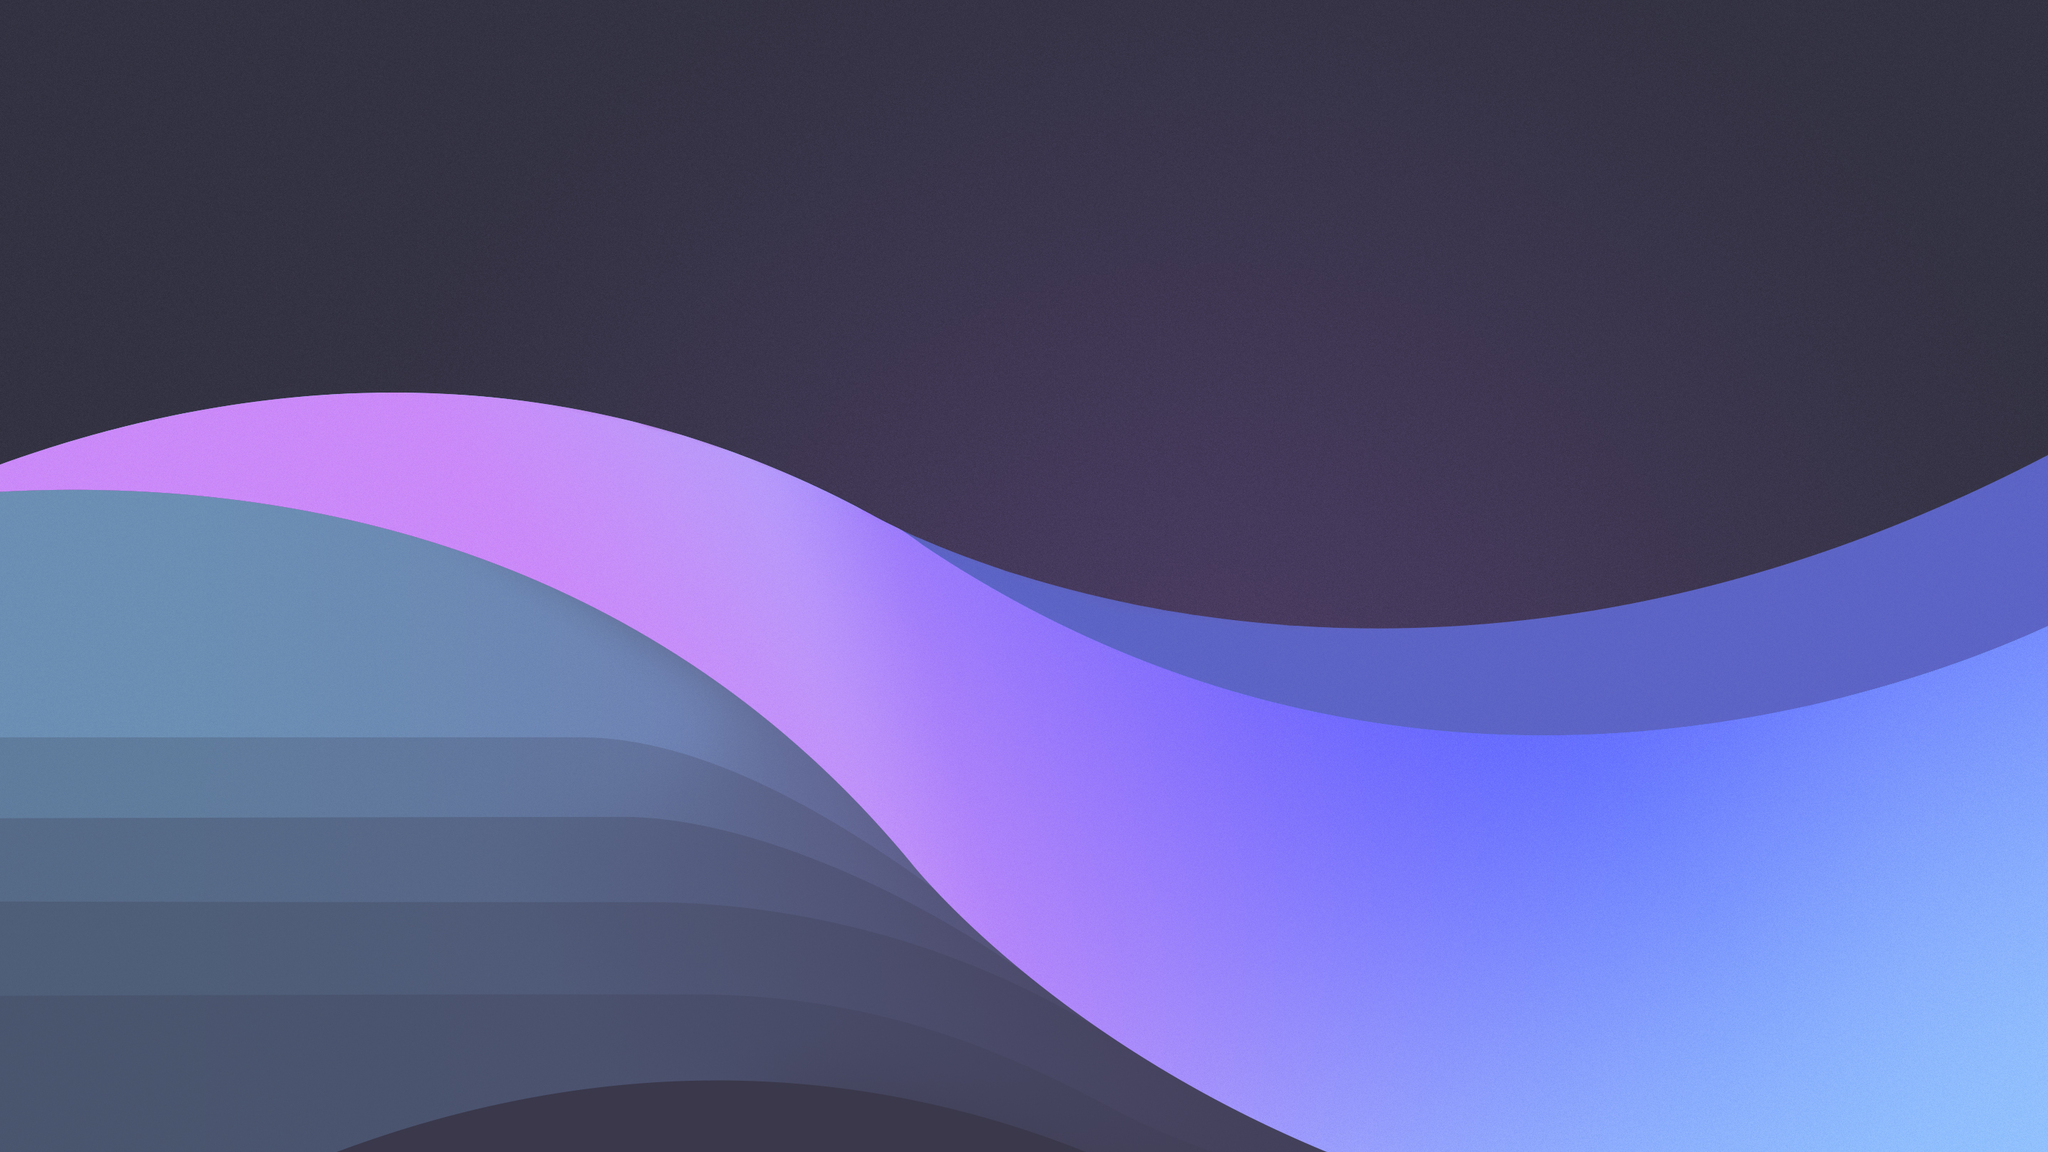 2048x1152 android nougat stock htc 2048x1152 resolution hd - Nougat wallpaper 4k ...